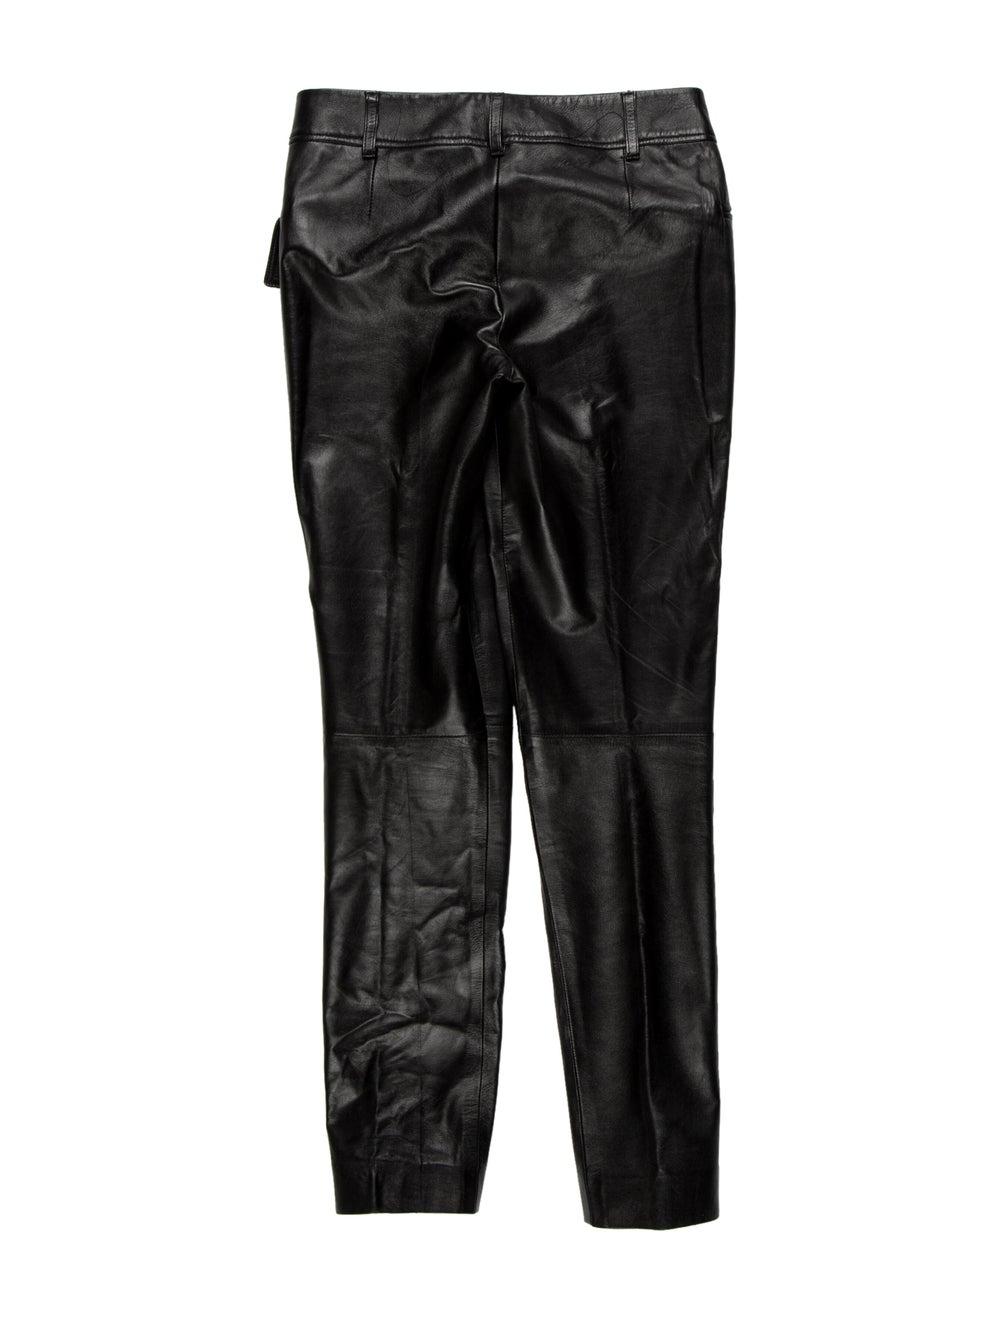 Prada Leather Skinny Leg Pants Black - image 2